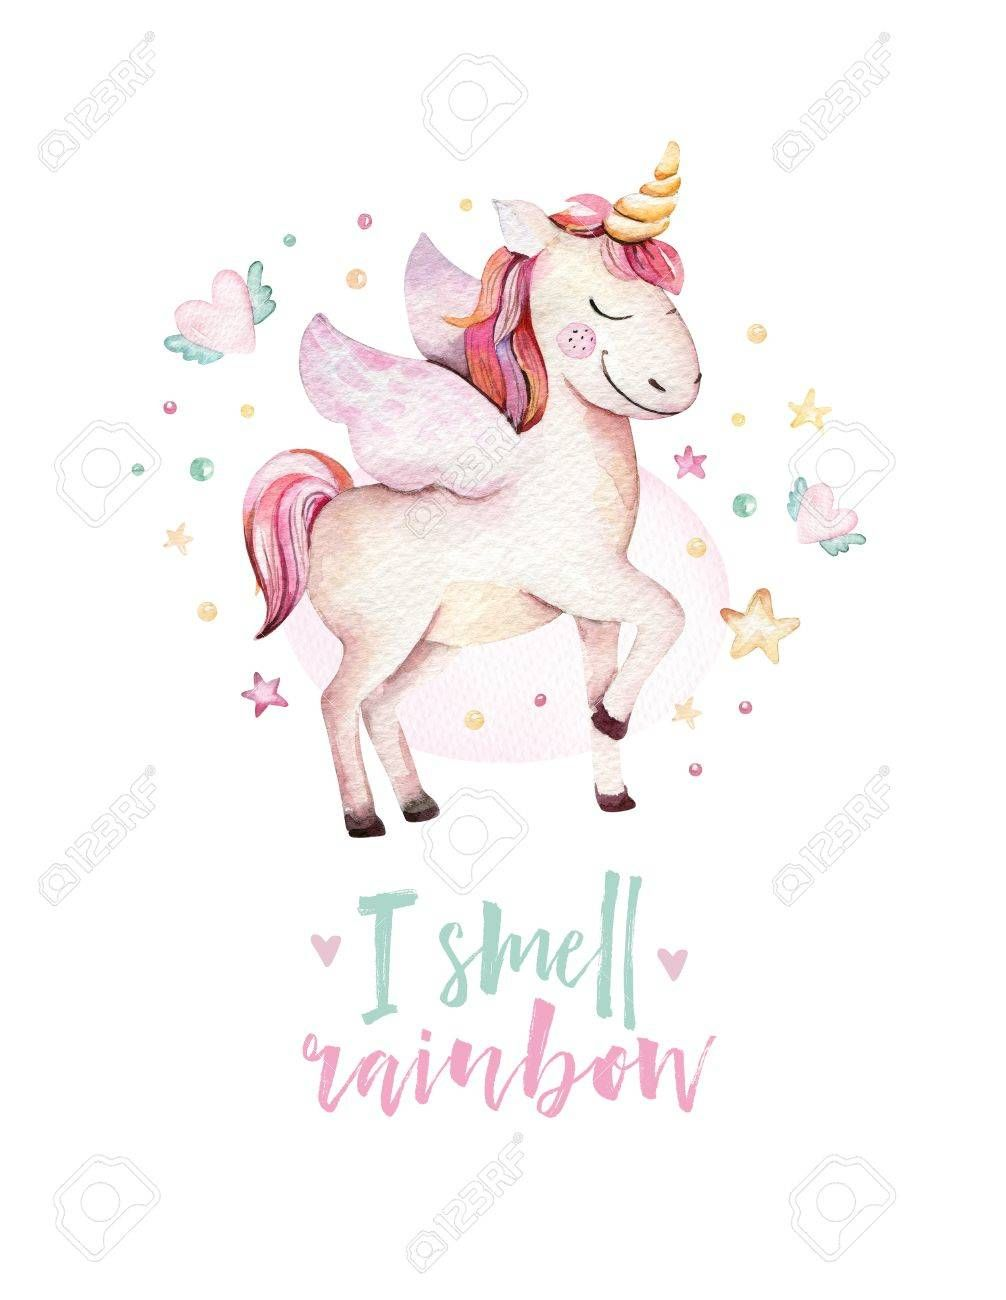 Isolated cute watercolor unicorn kids poster. Nursery unicorns illustration. Princess unicorns drawing. Trendy pink cartoon magic horse. , #spon, #poster, #kids, #unicorns, #Nursery, #cute